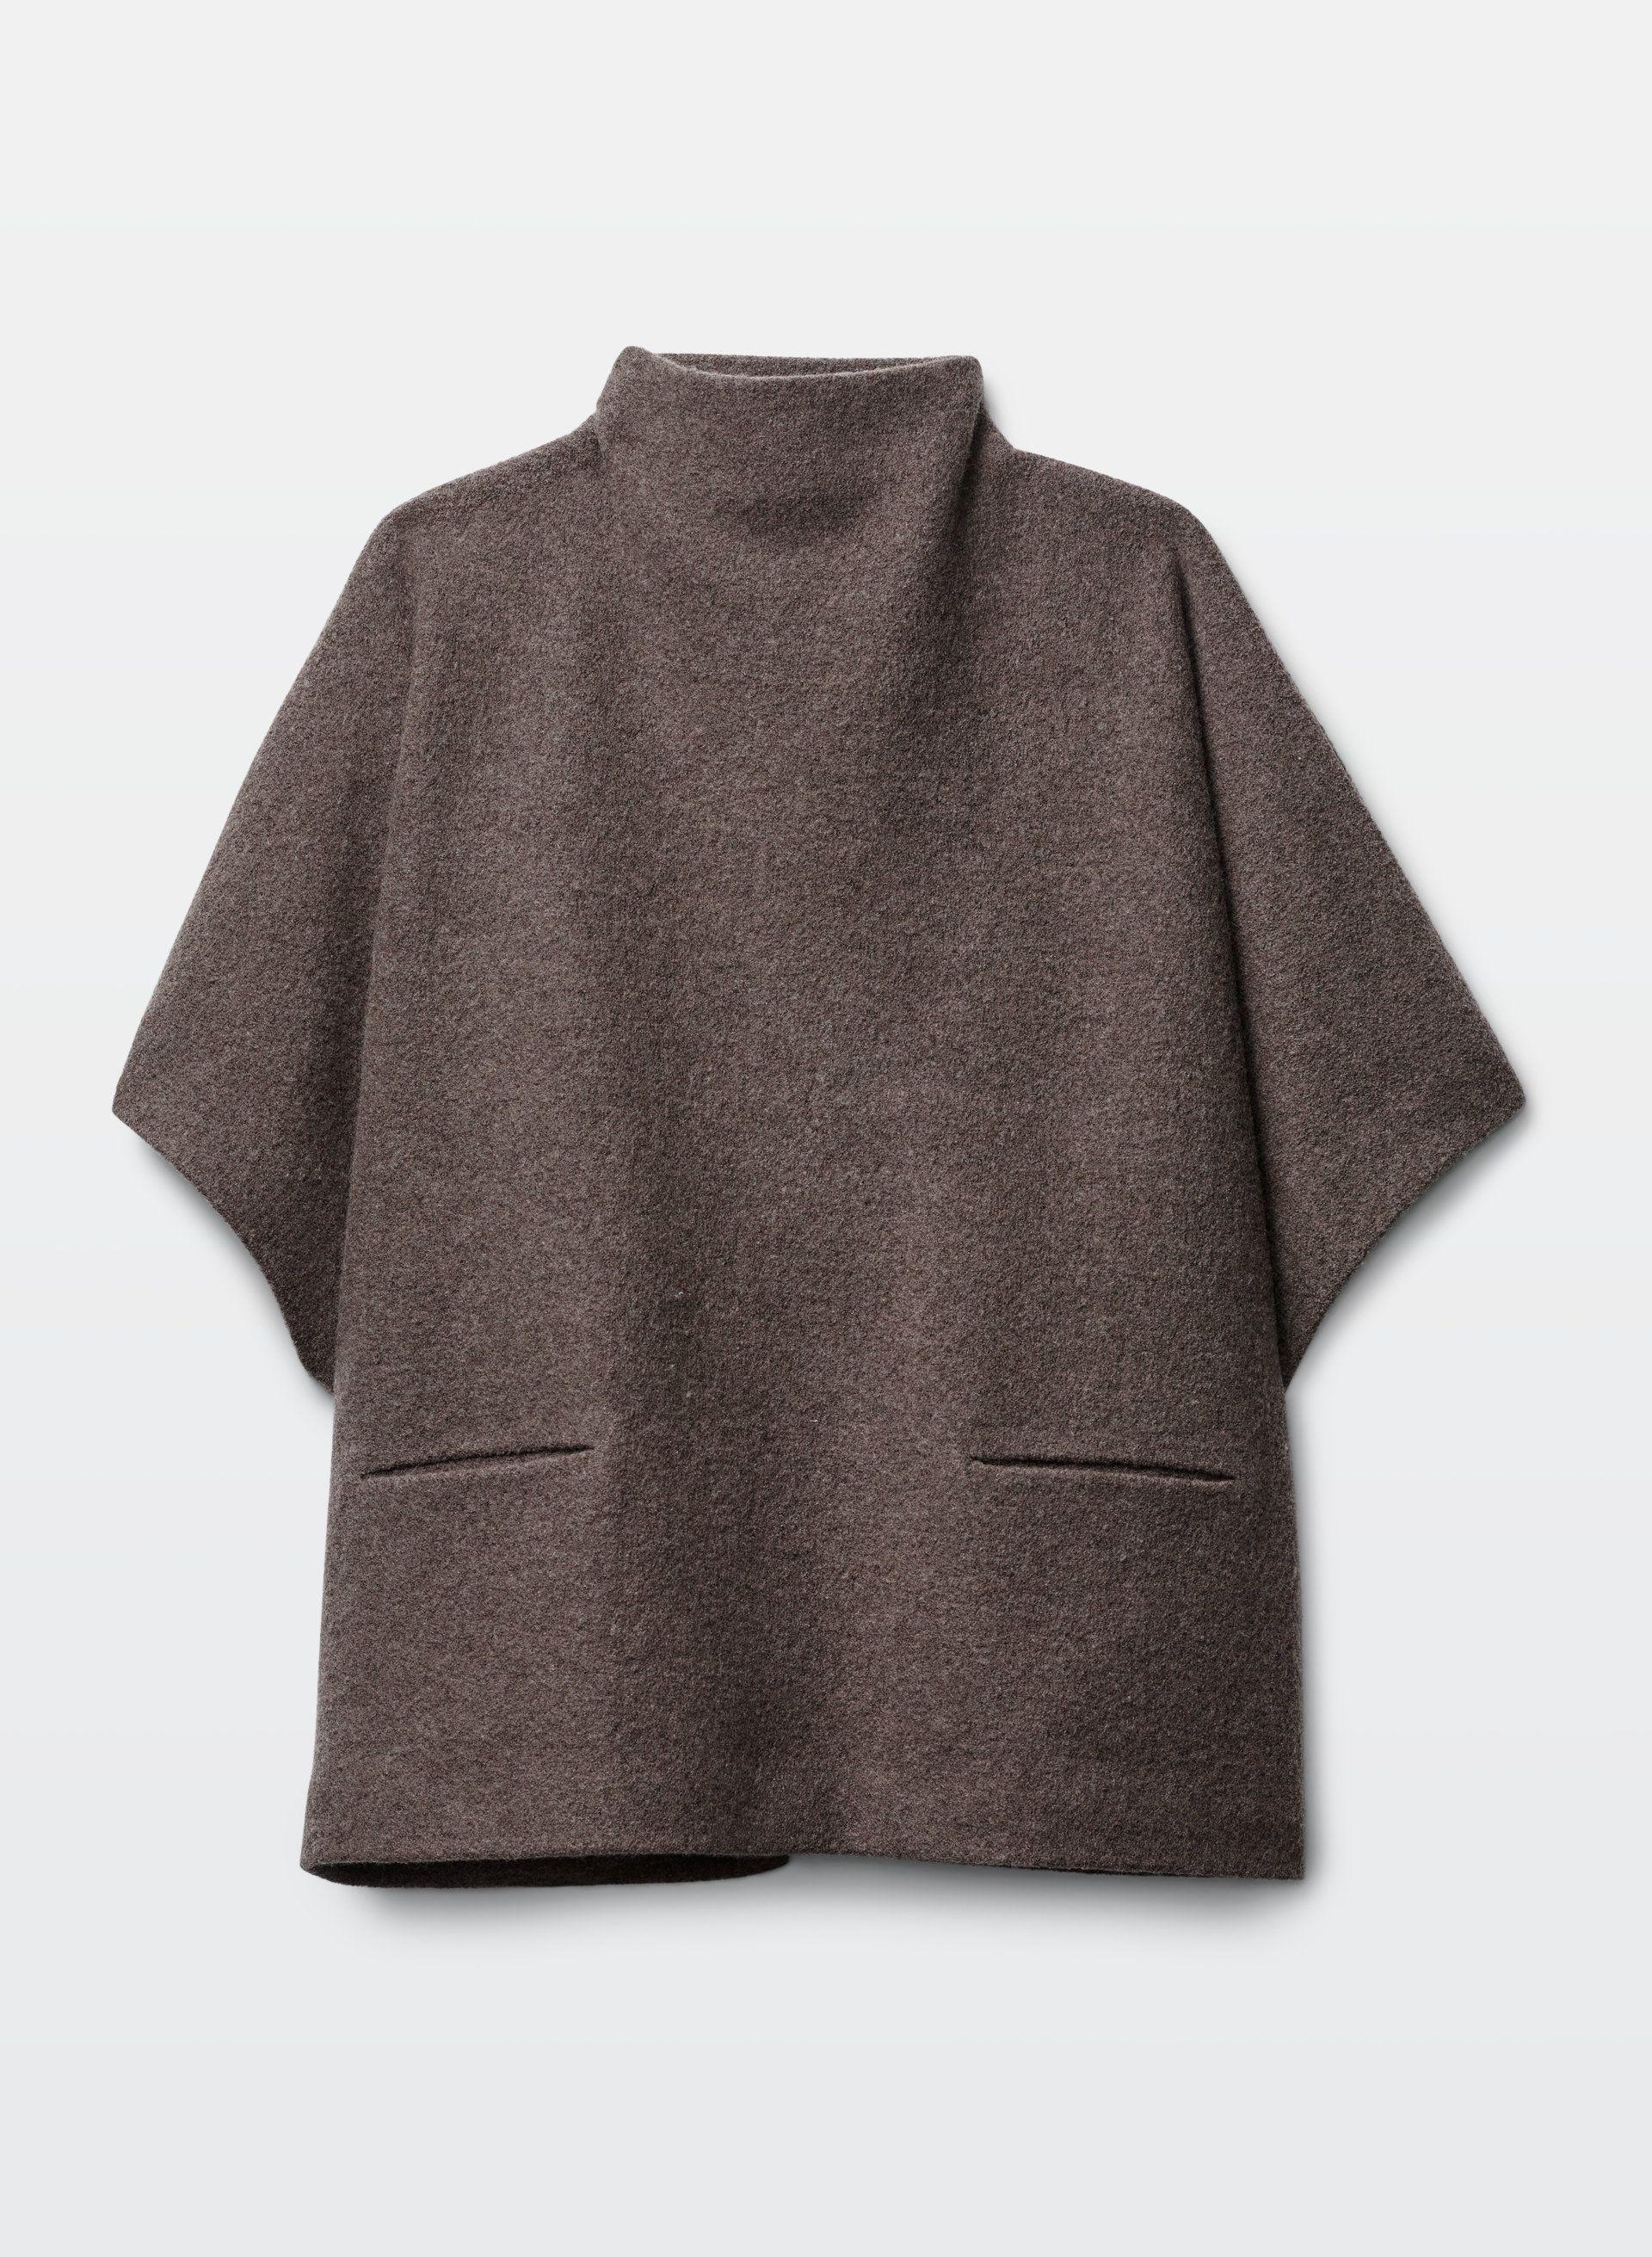 Touraine sweater